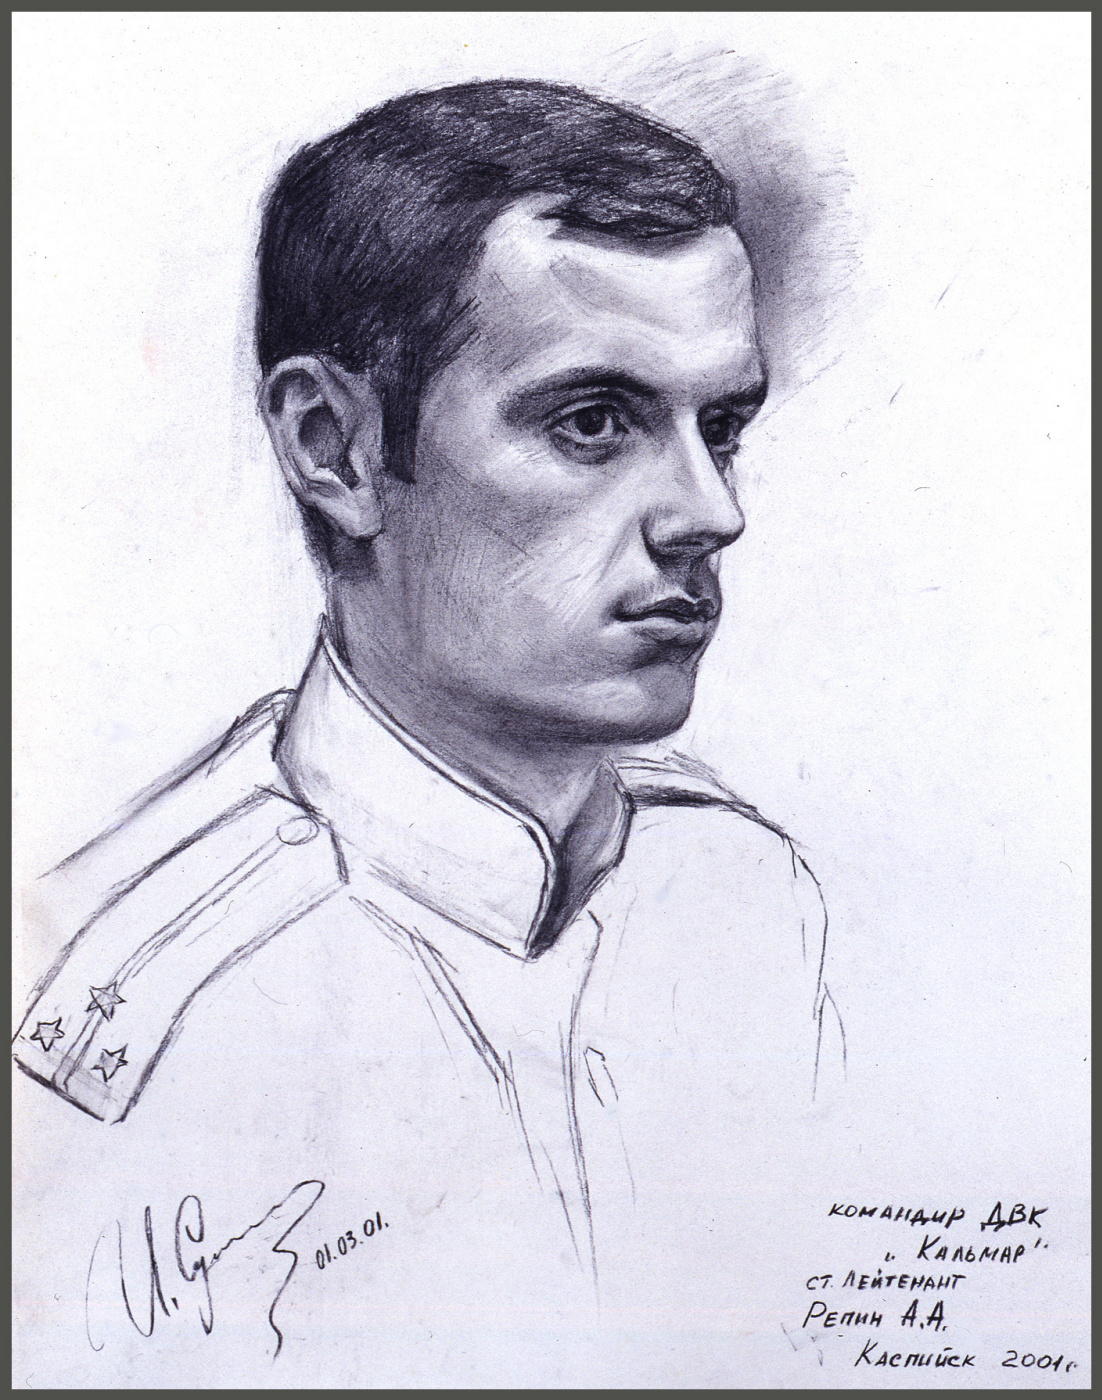 Sushienok64 @ mail.ru Mikhailovich Sushenok Igor. Art. Lieutenant Repin A.A.